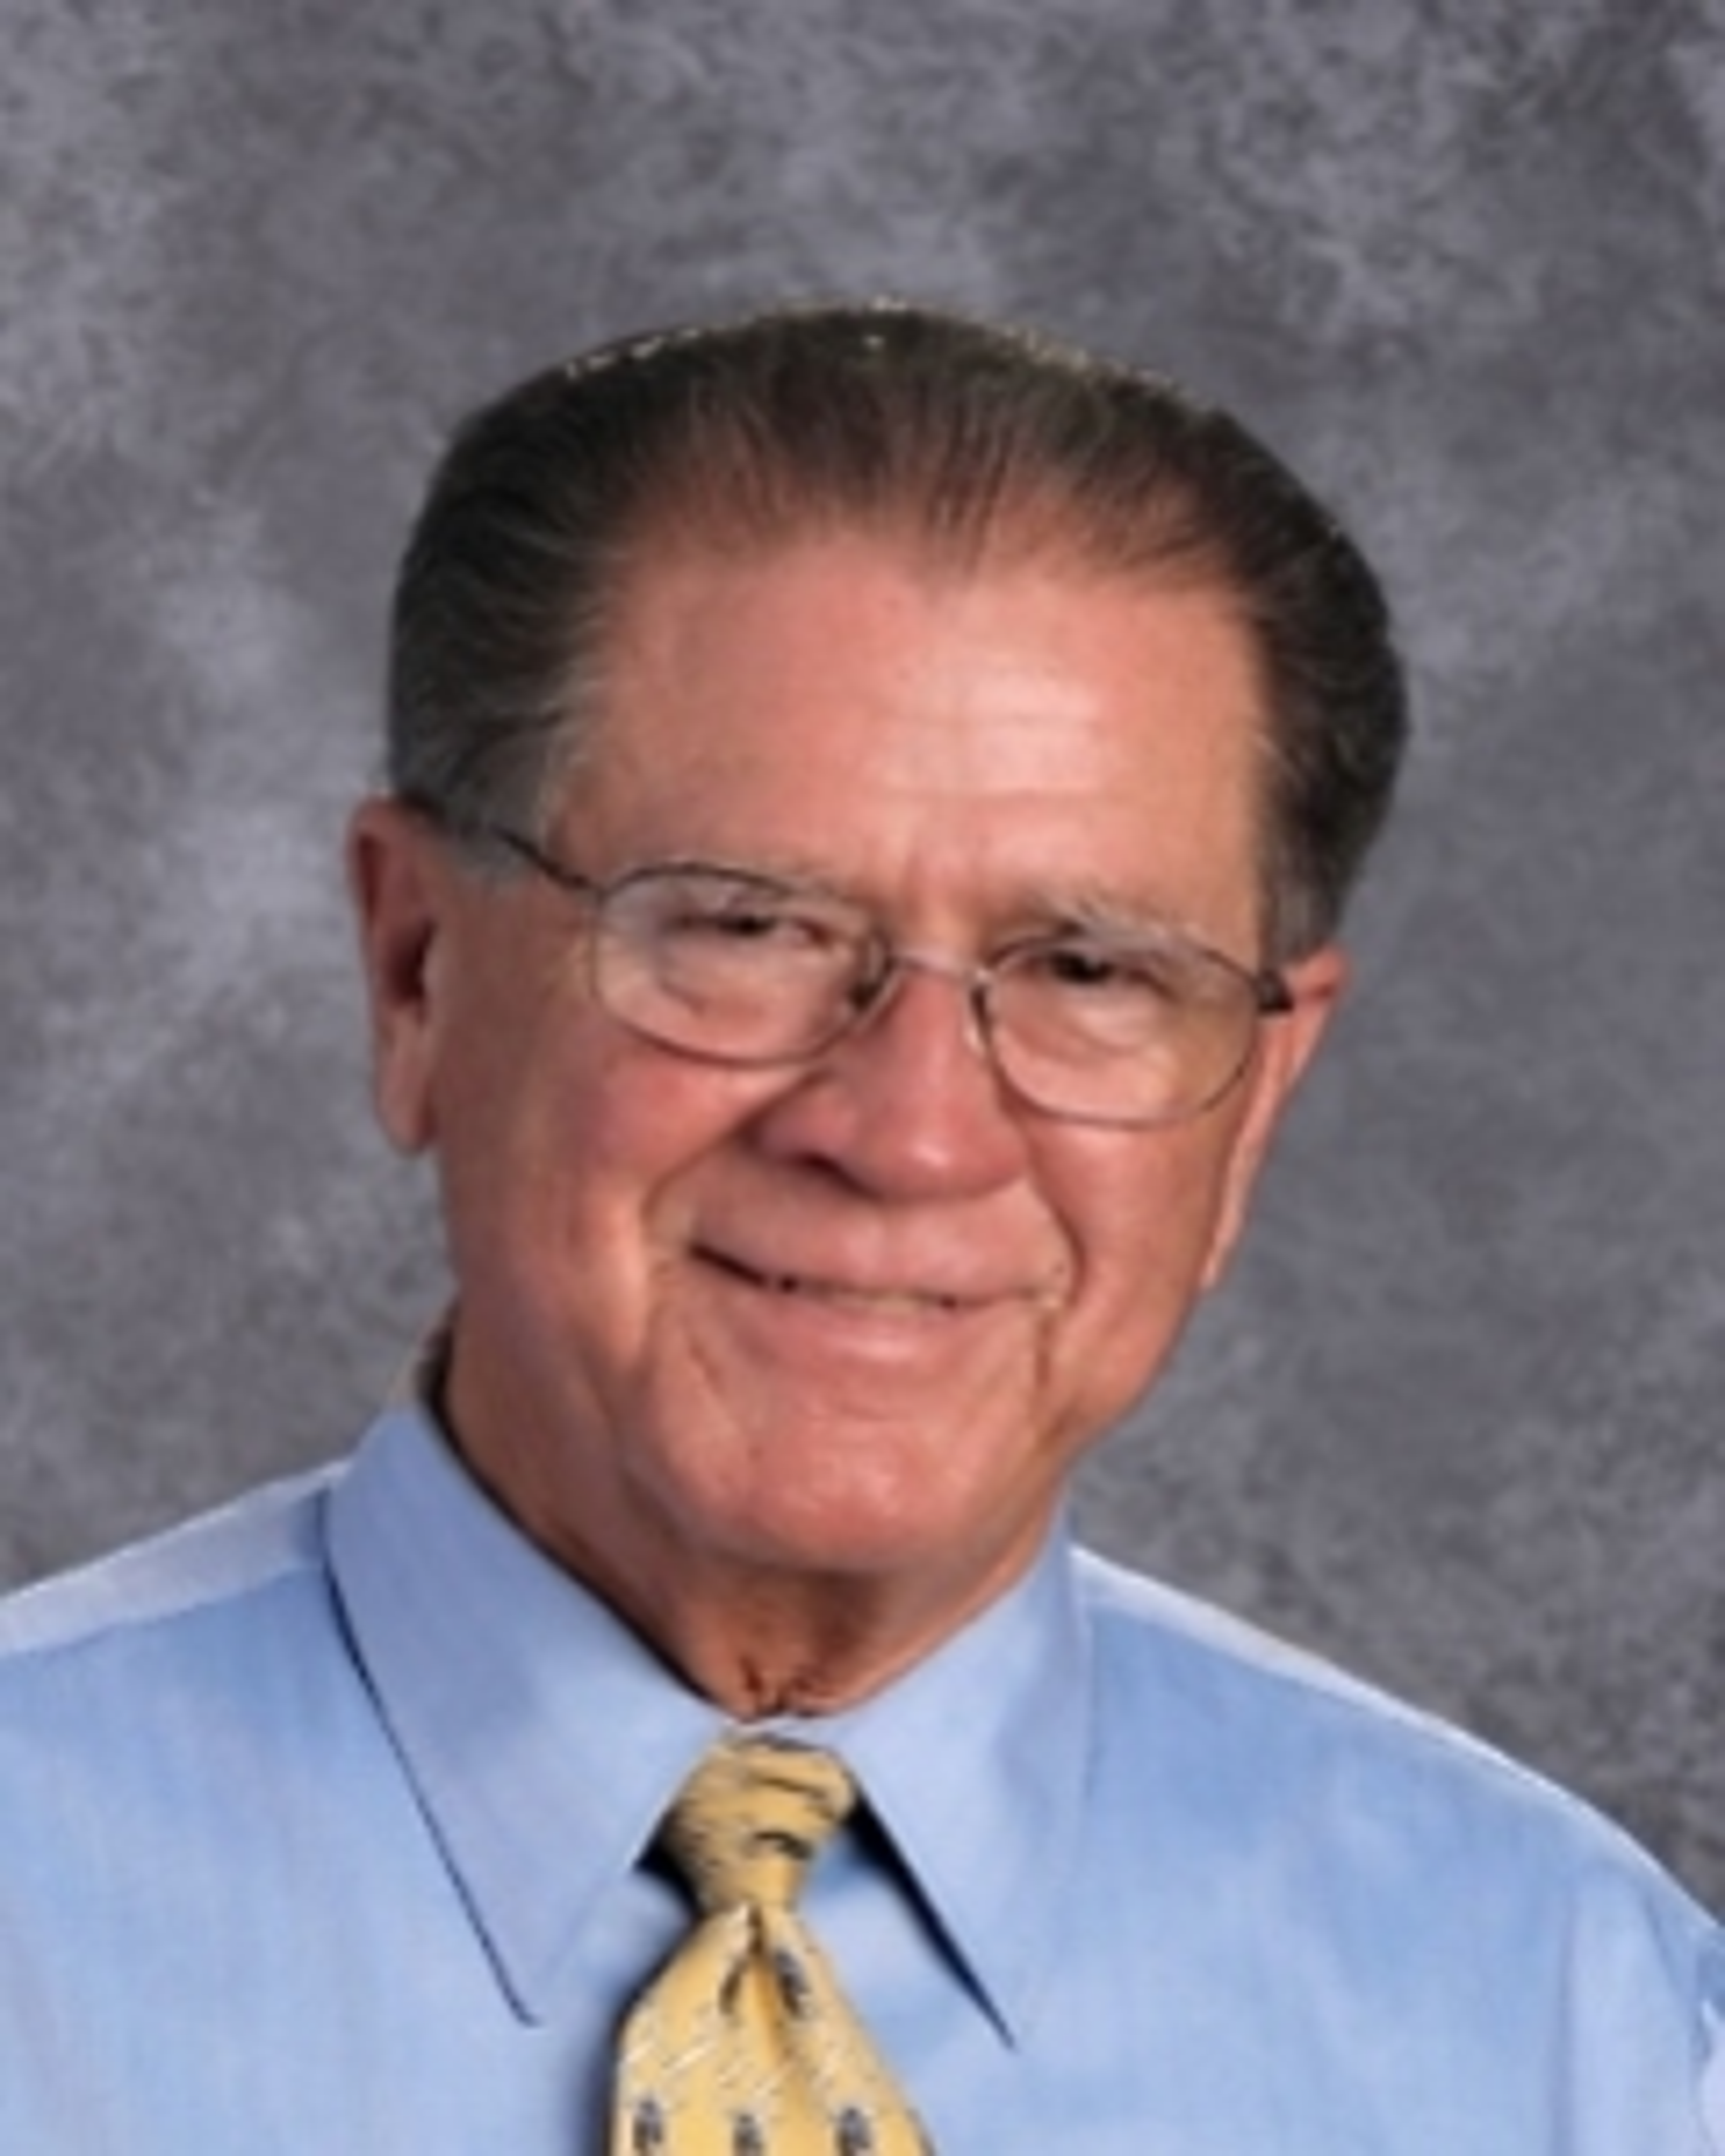 Photo of Mr. Coffman